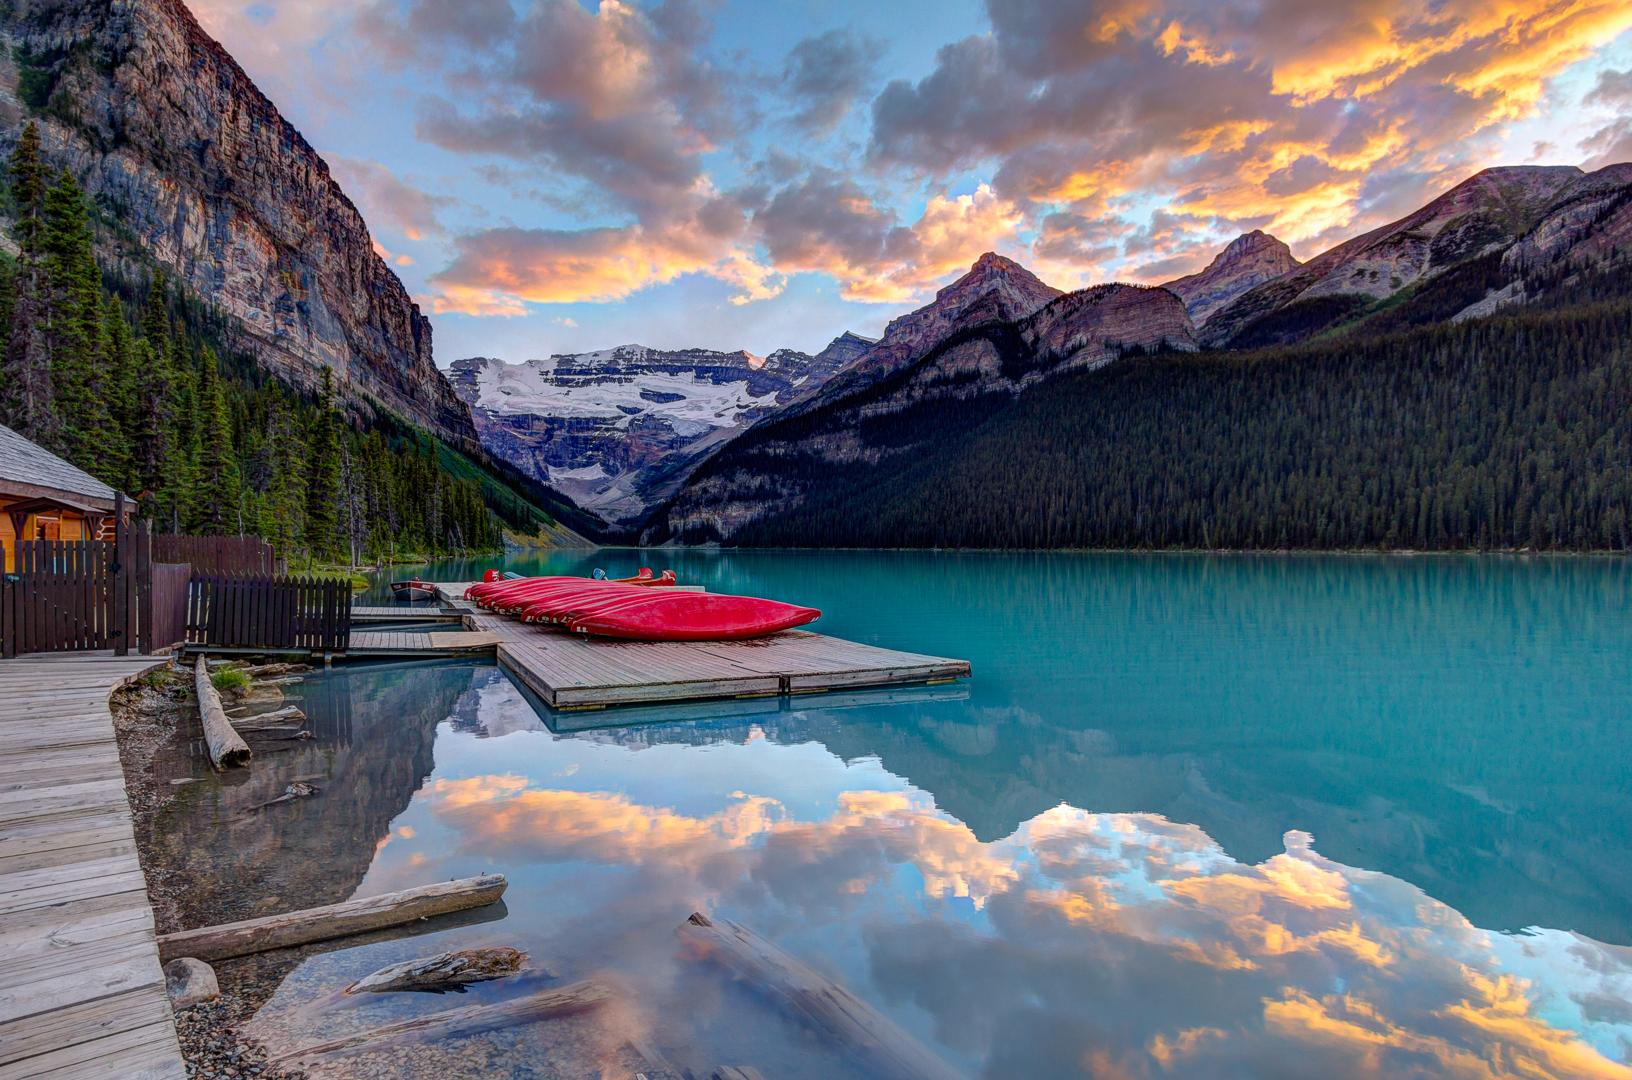 Canoes at Lake Louise, Canada